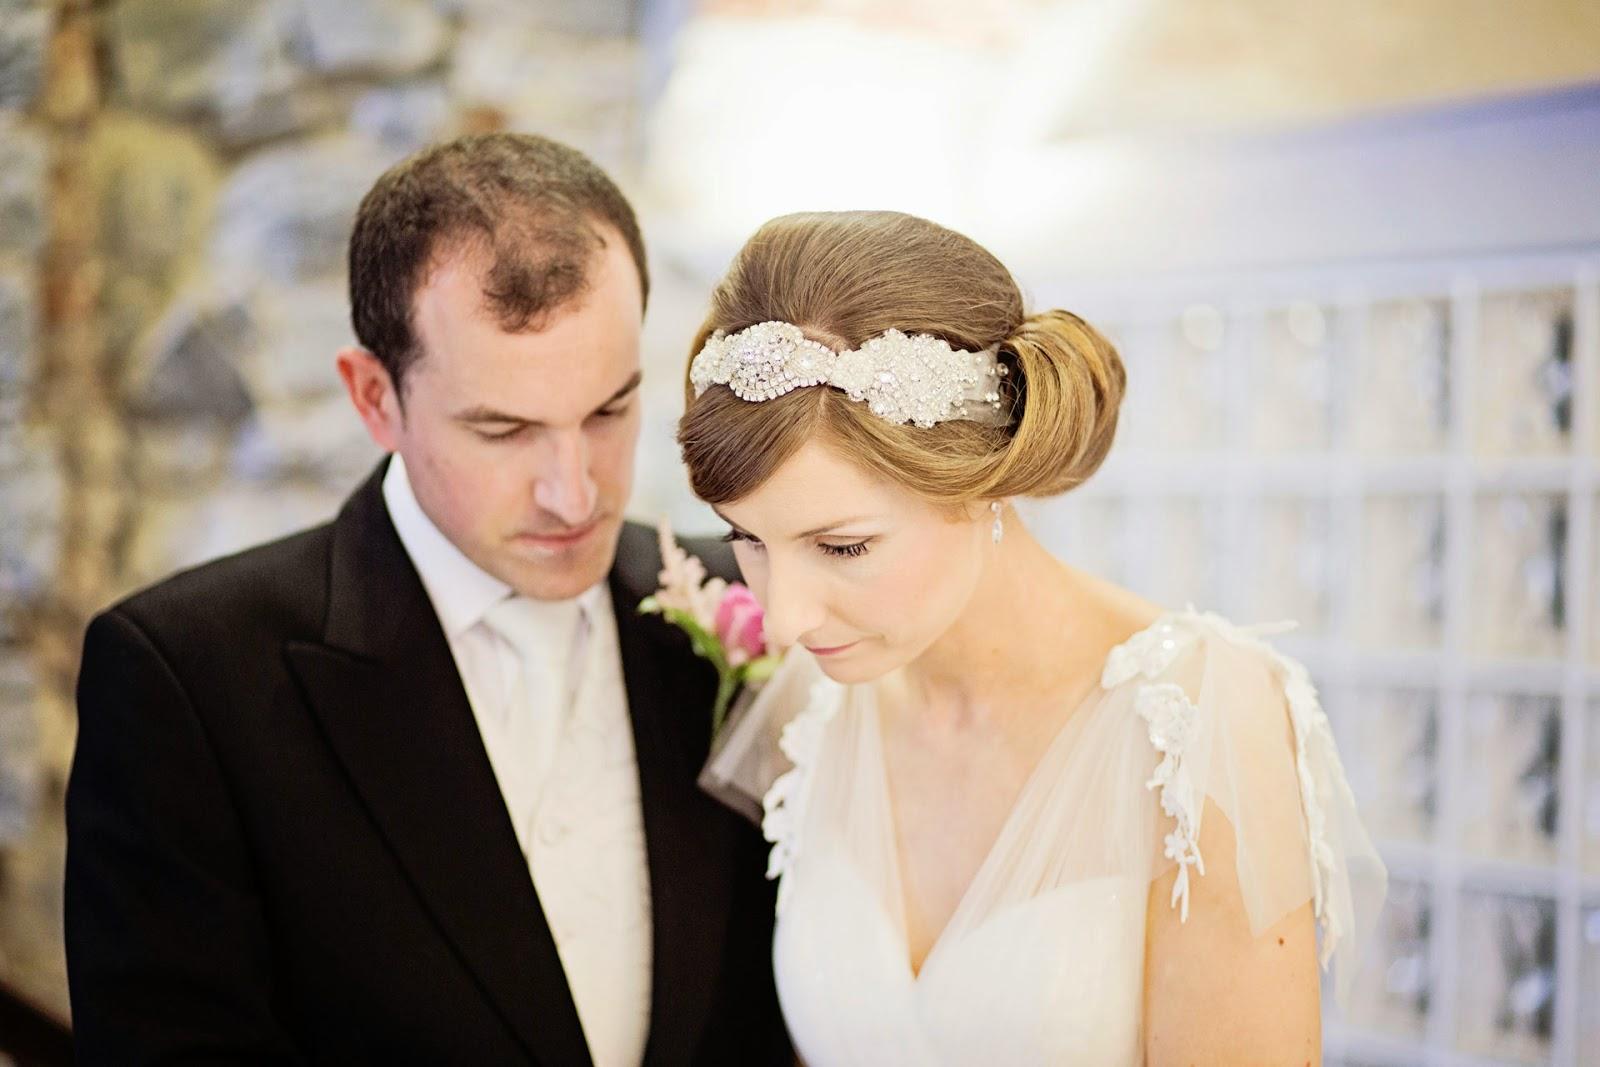 katie kav photography: louise & stephen, kilkenny castle wedding